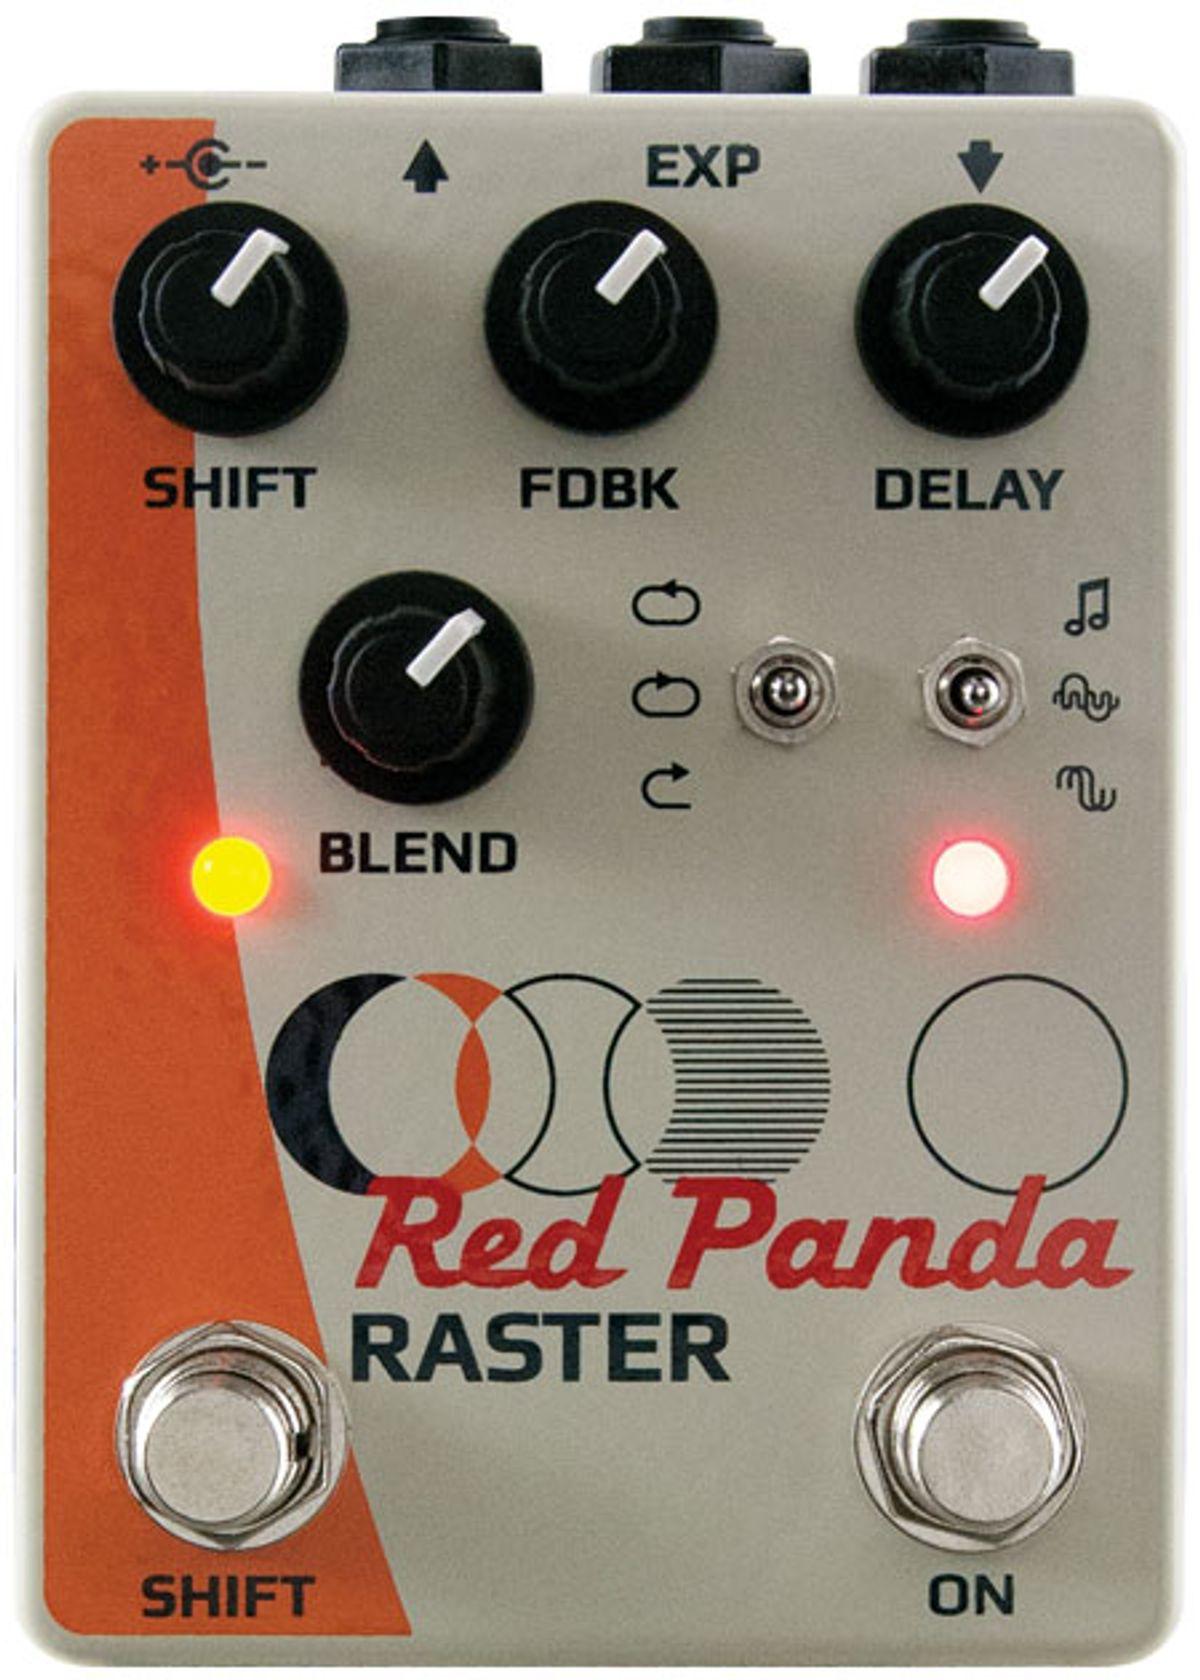 Red Panda Lab Raster Delay Review